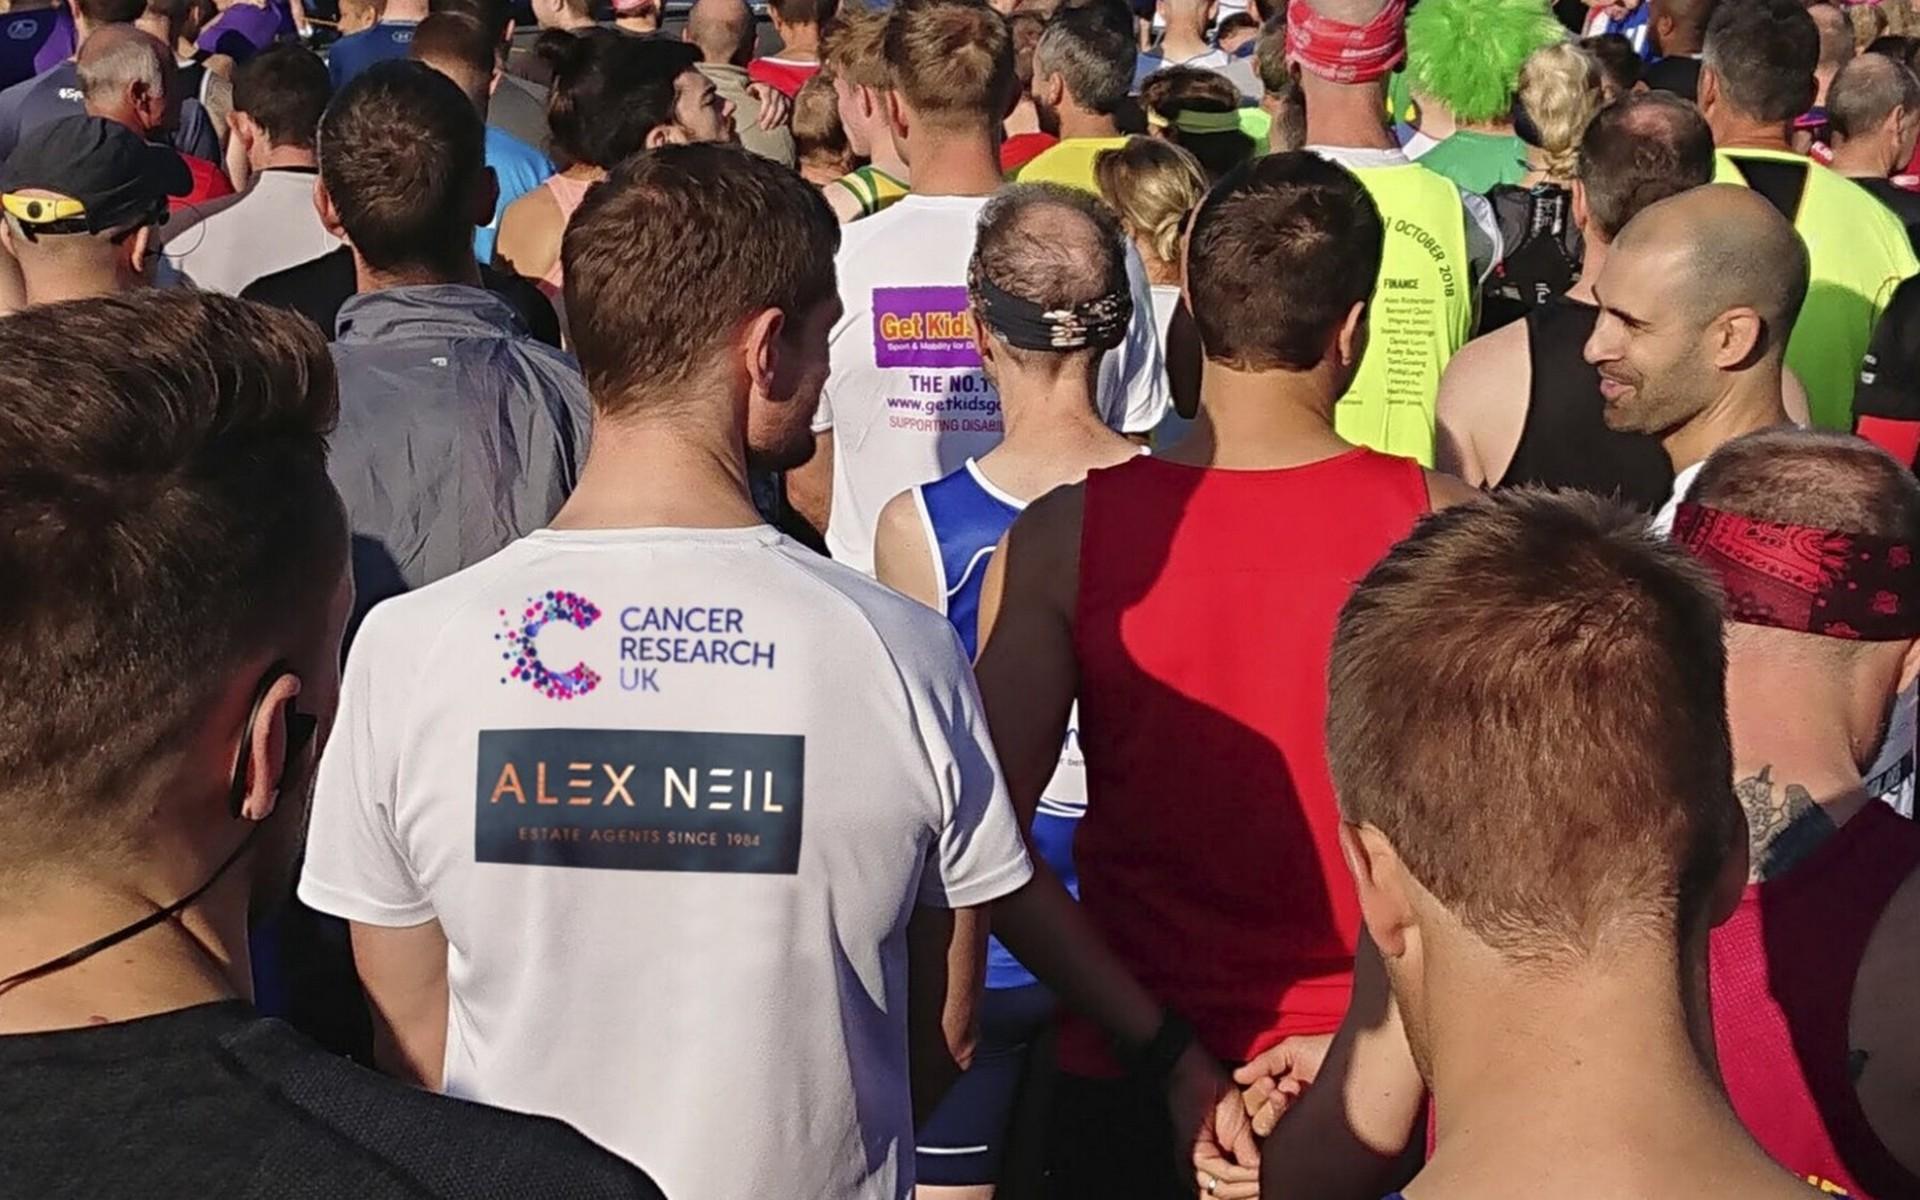 Alex Neil's Cancer Research Running Team